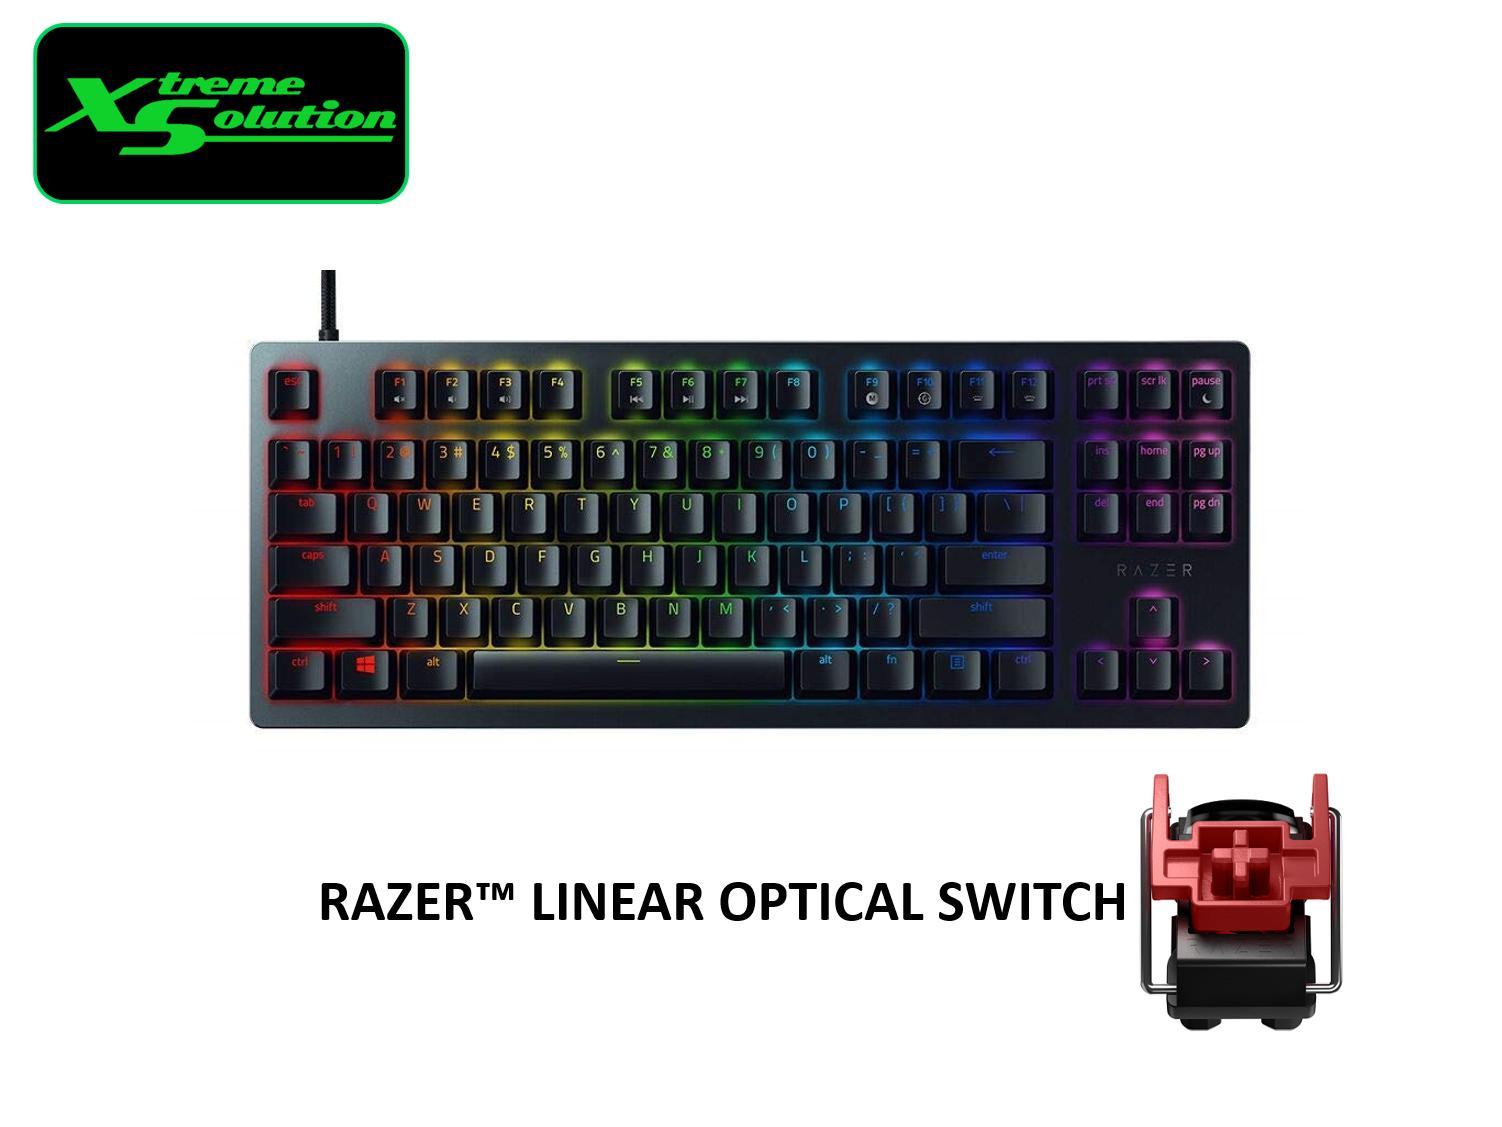 Razer Huntsman Tournament Edition (Razer Linear Optical Switch) Singapore